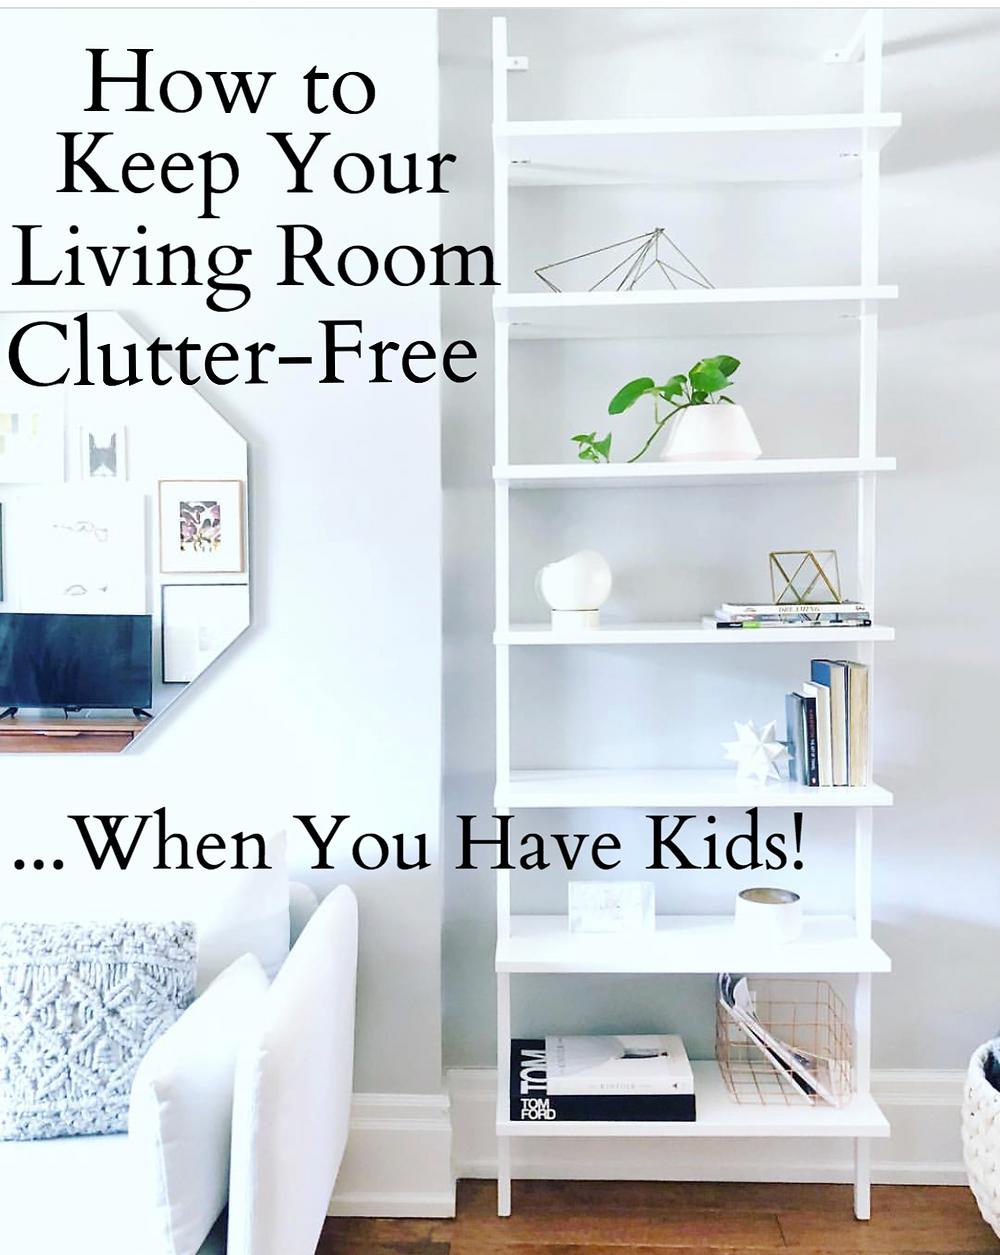 Living room toy storage